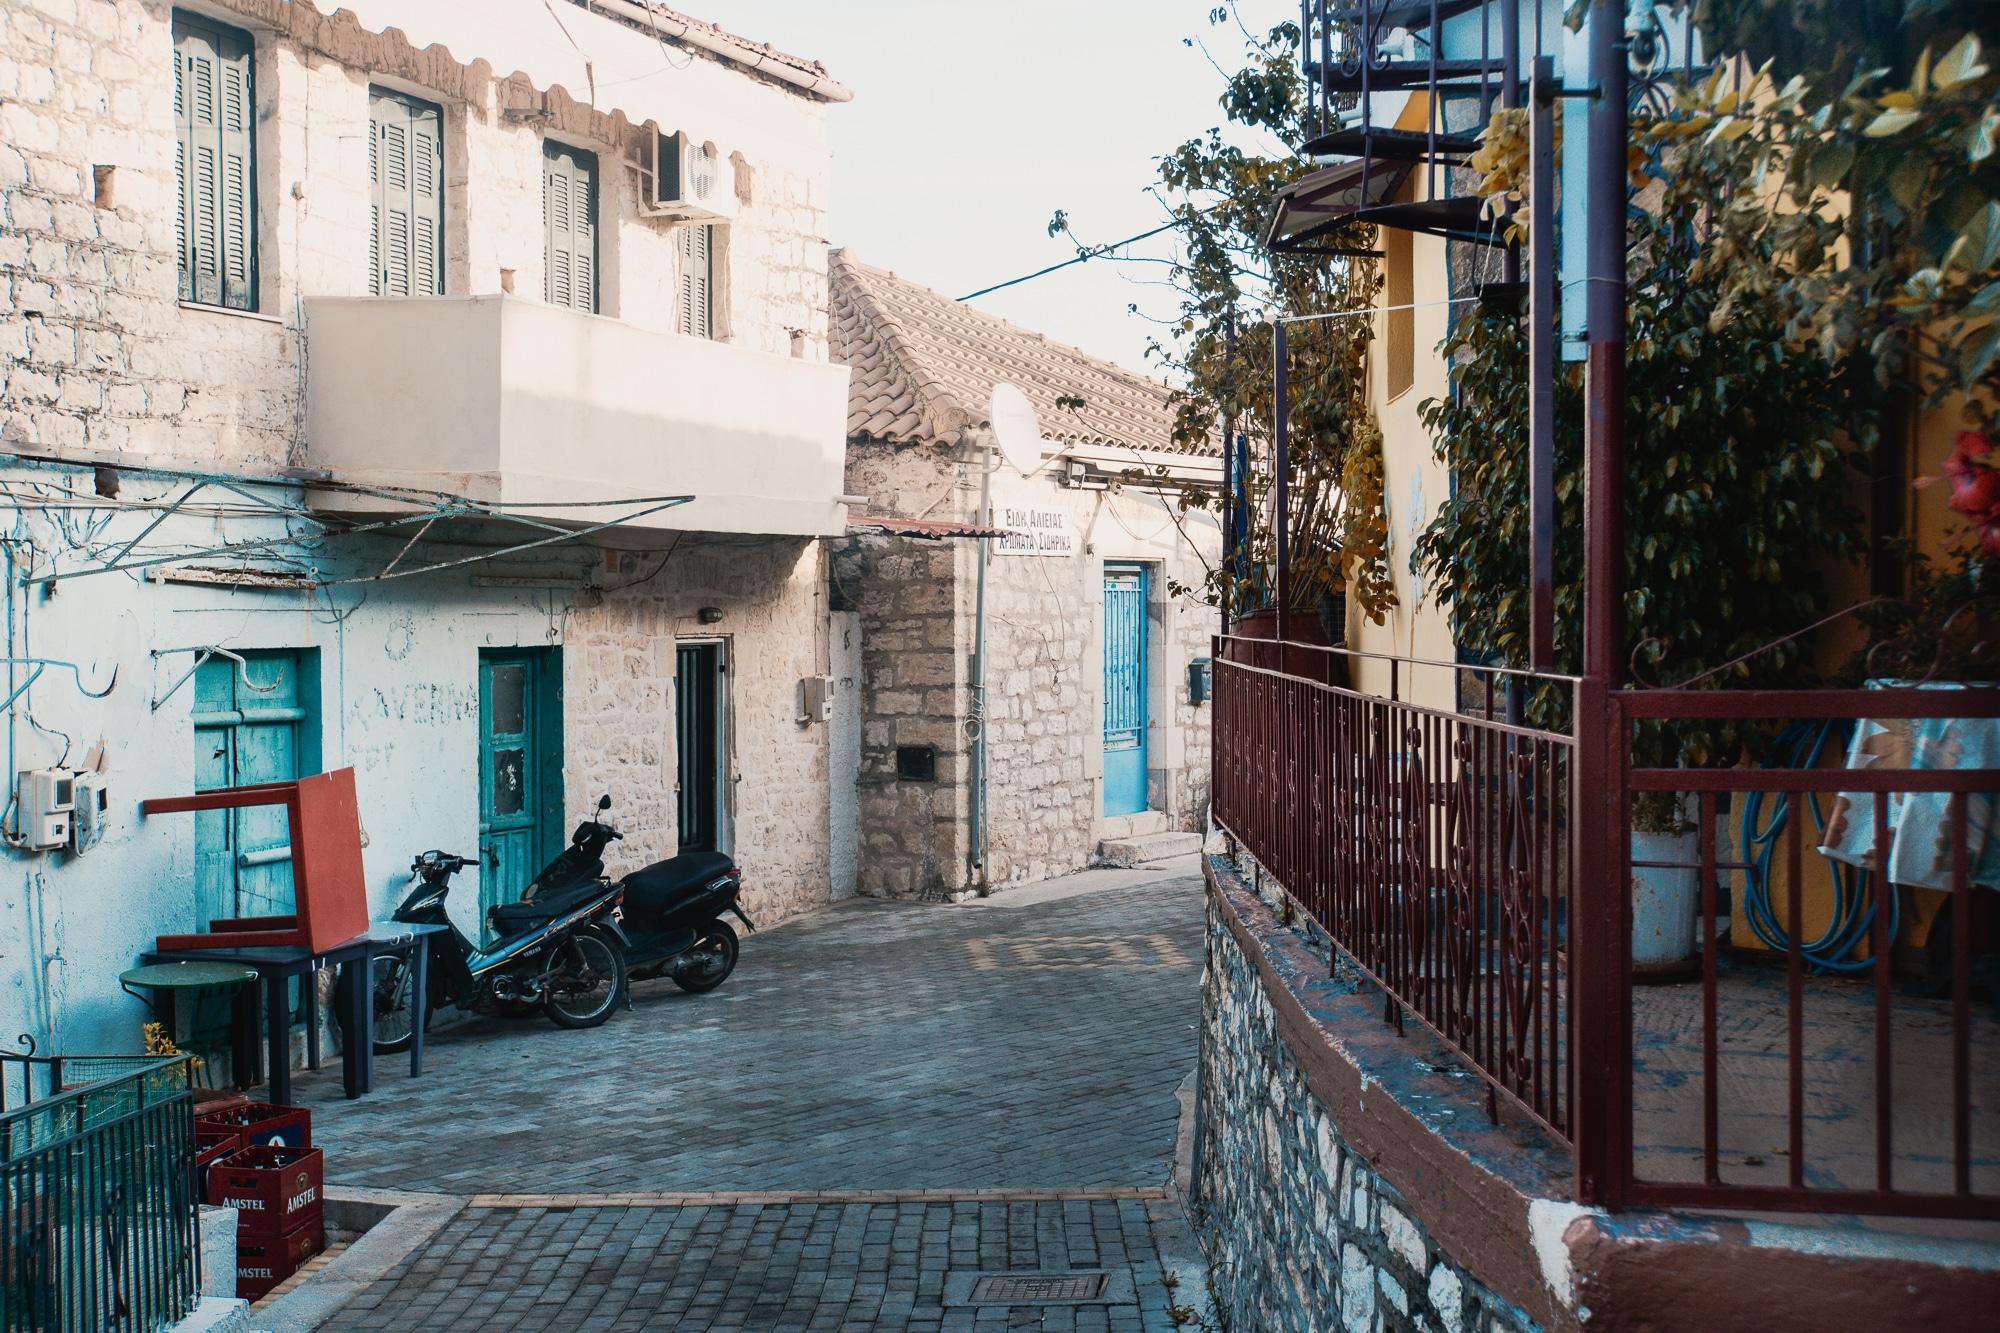 Meganisi: Spaziergang durch das Dorf Katomeri